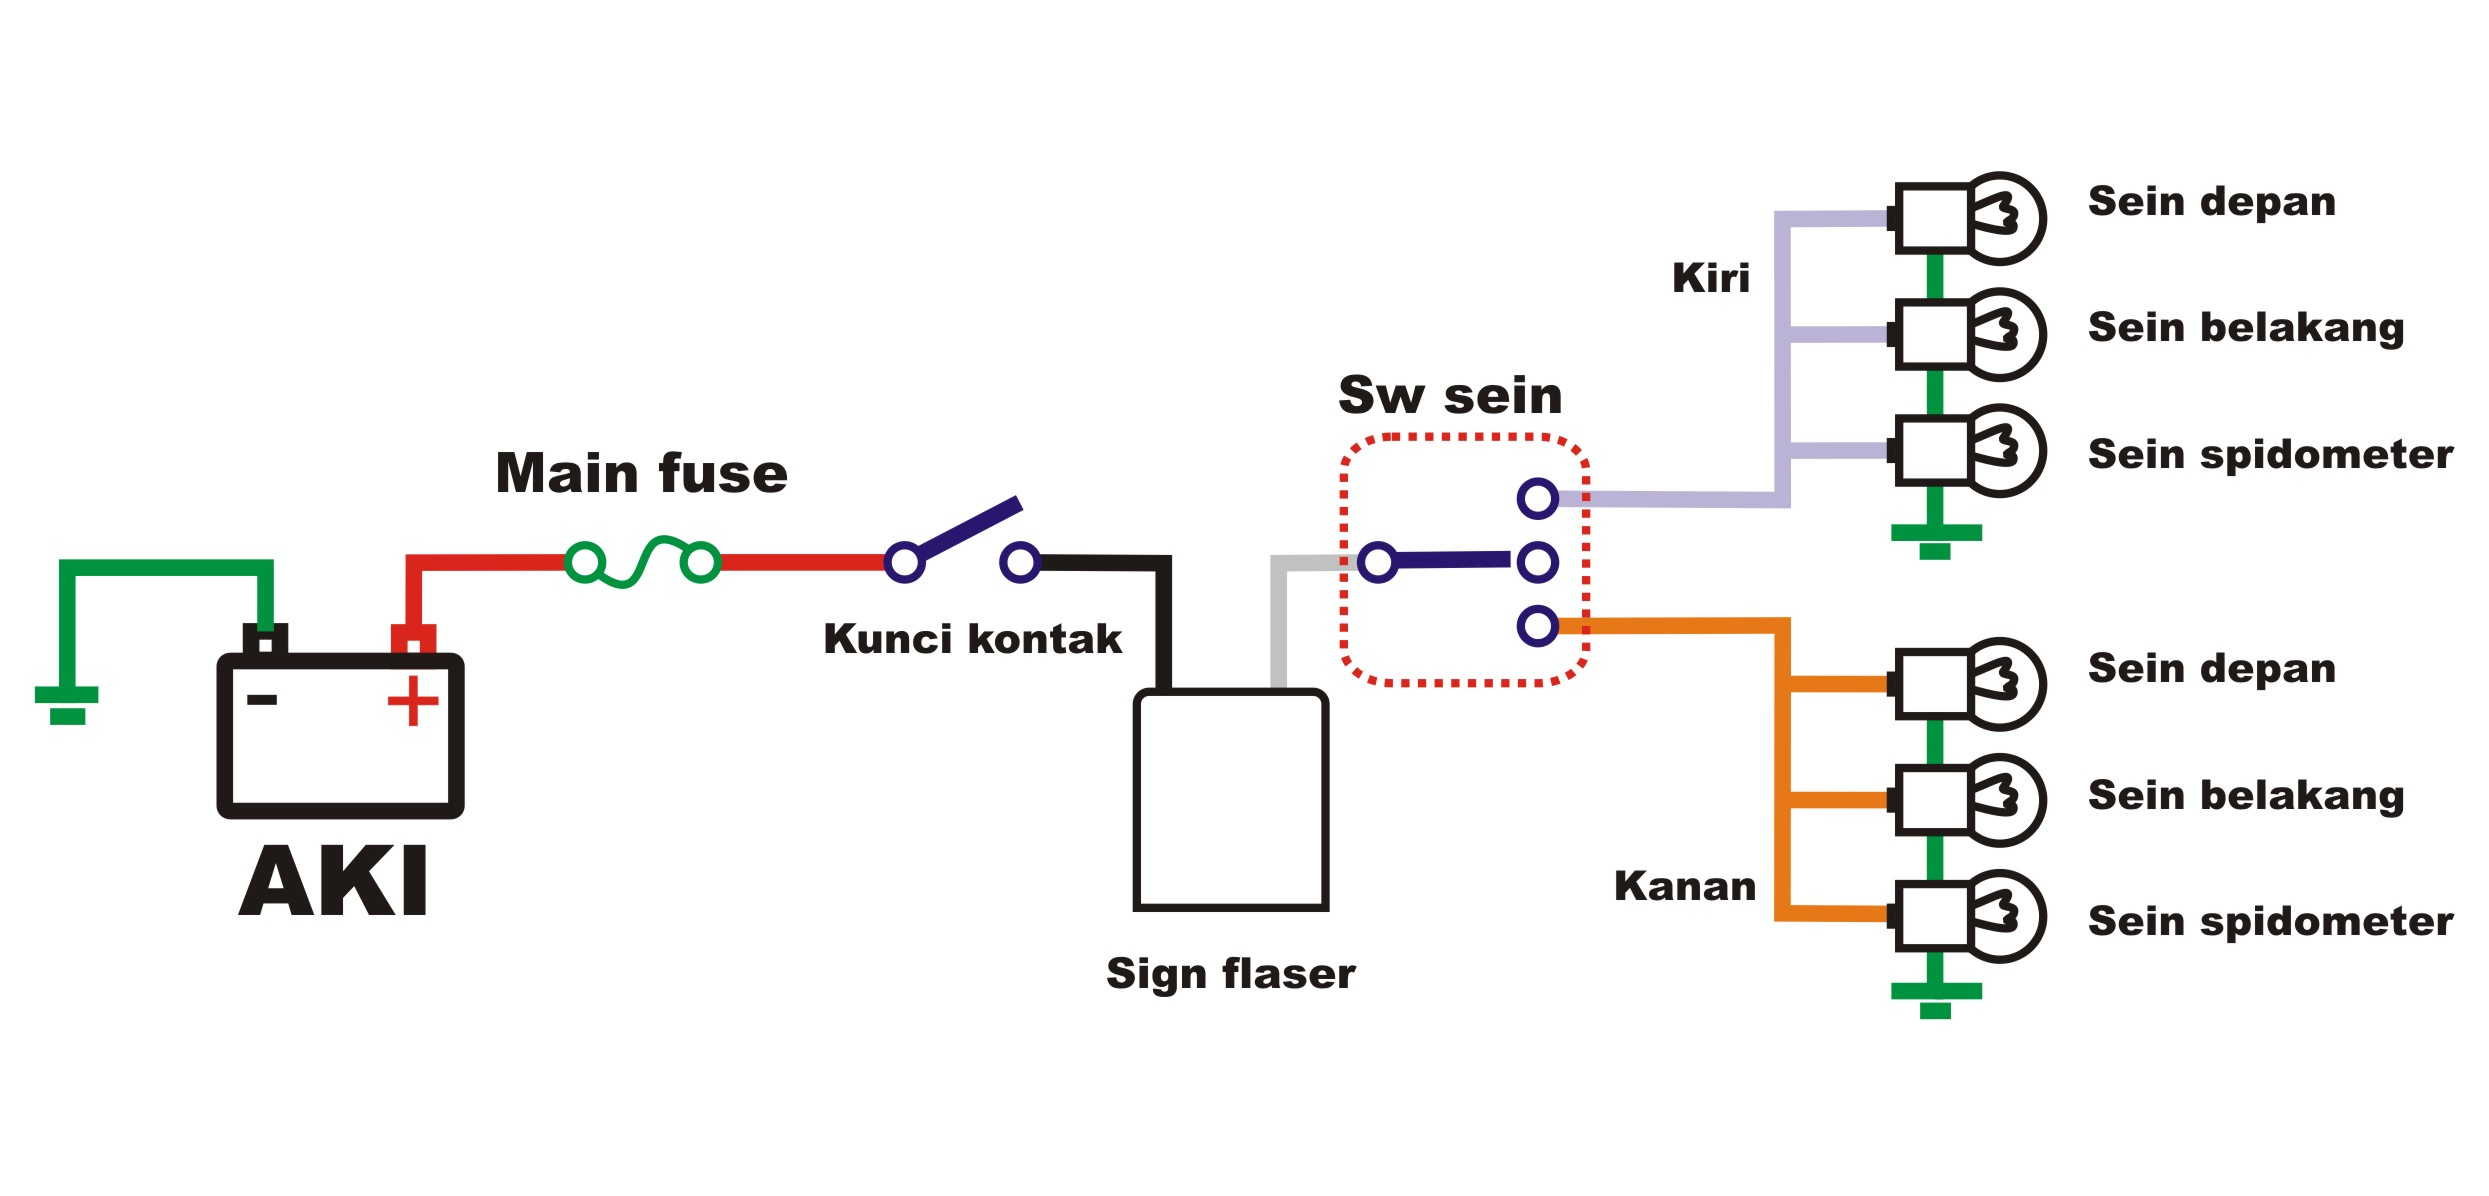 Gambar wiring diagram ac wiring diagram outdoor unitsc1st free download wiring diagram bahas kelistrikan wiring harness part2 diy4all of gambar wiring diagram ac cheapraybanclubmaster Choice Image